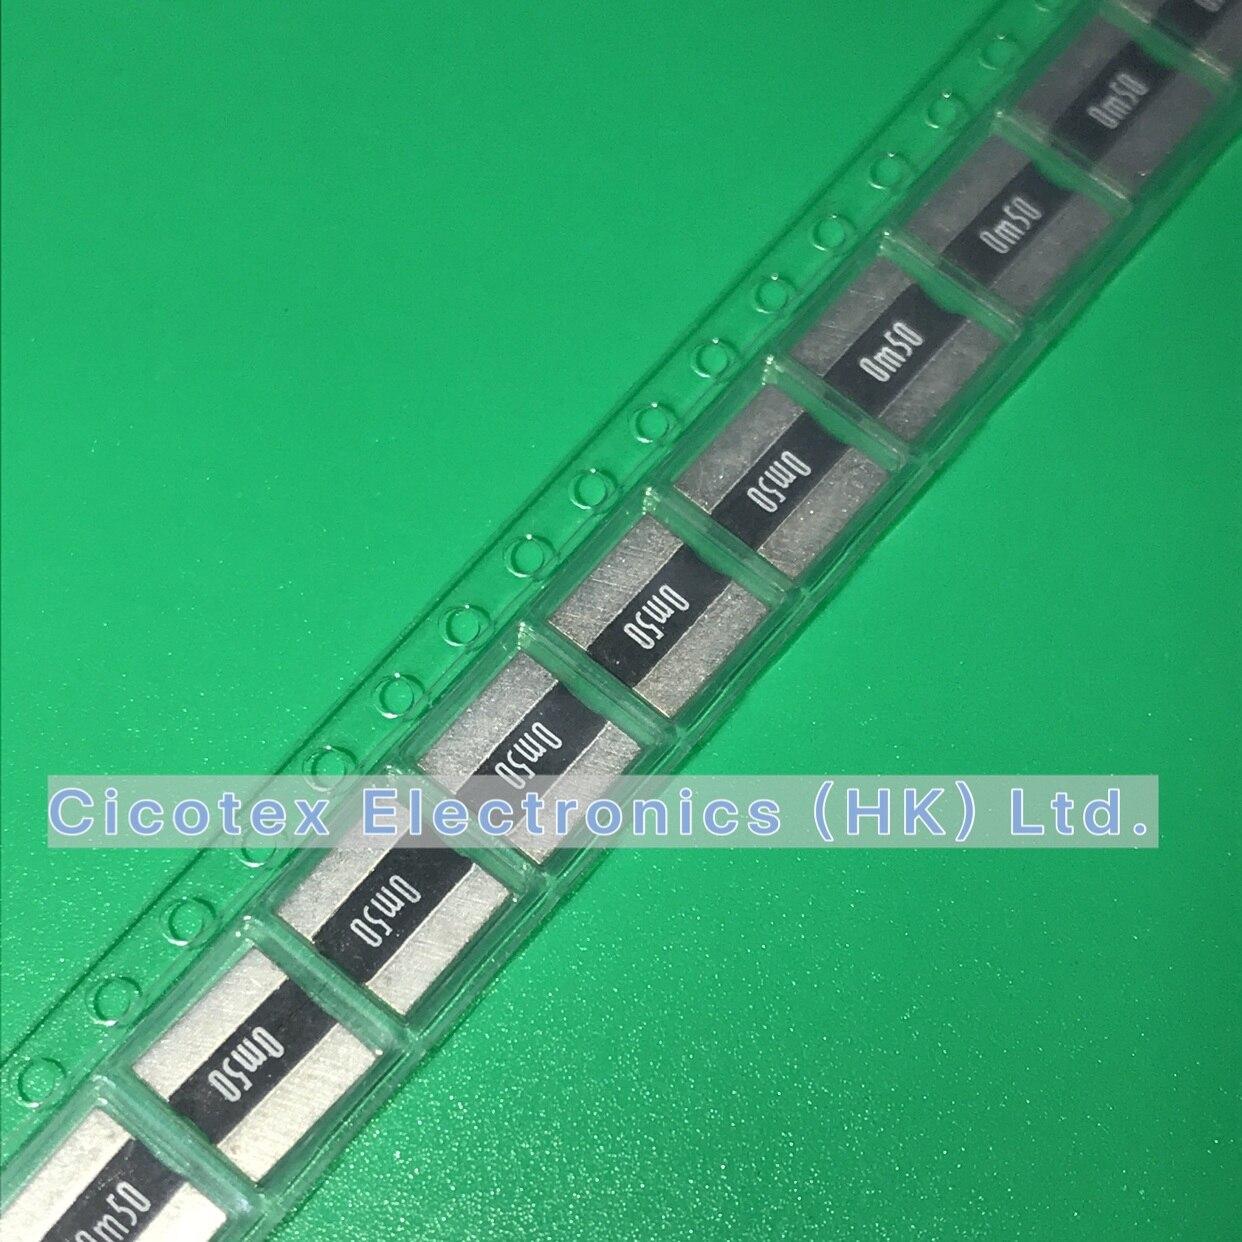 10pcs/lot LR2725-24R0005F1 SMD LR 2725-24 R0005F1 4W 1% R0005 0.0005R 0.5MR 0m50 LR2725 LR272524R0005F1 2725-0.0005RF